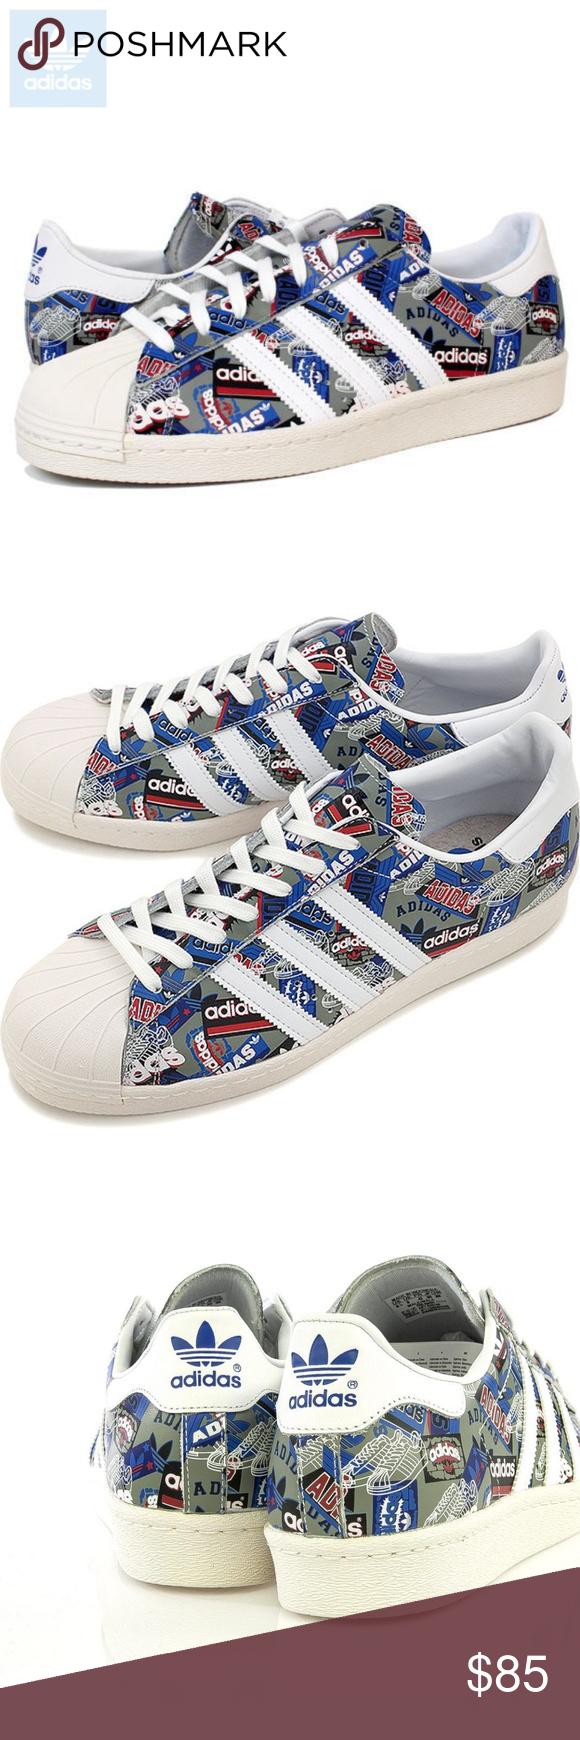 adidas superstar 80s pioneers nigo Size MADE